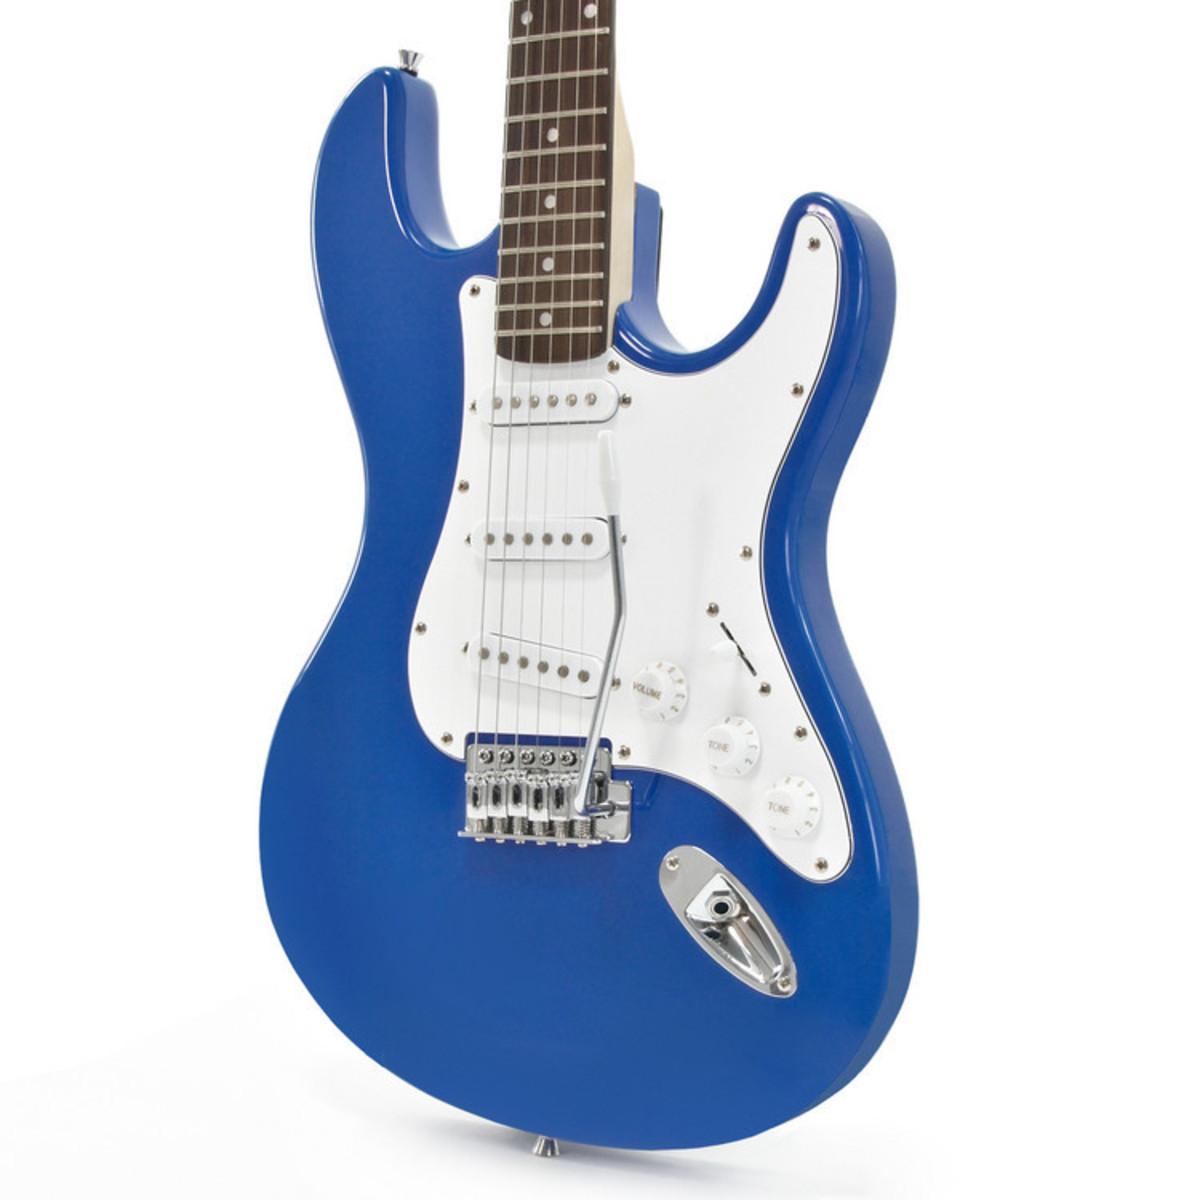 Rocksmith 2014 Xbox 360 + LA E-Gitarre, blau bei Gear4music